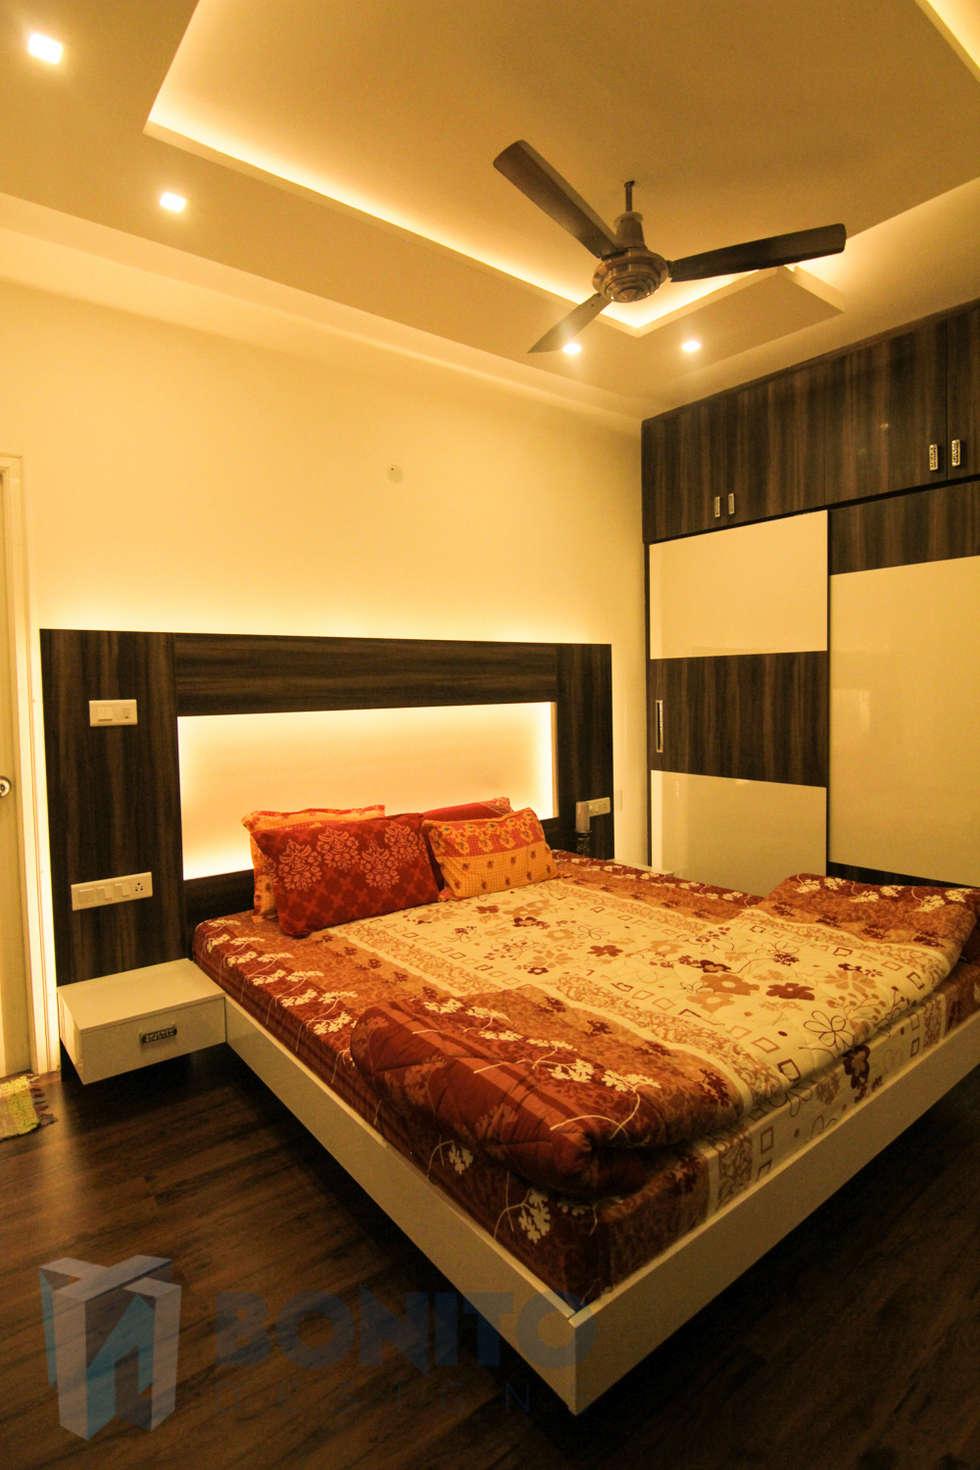 Master bedroom cot and wardrobe design  asian Bedroom by Bonito Designs  Bangalore. Asian bedroom photos  master bedroom cot and wardrobe design   homify